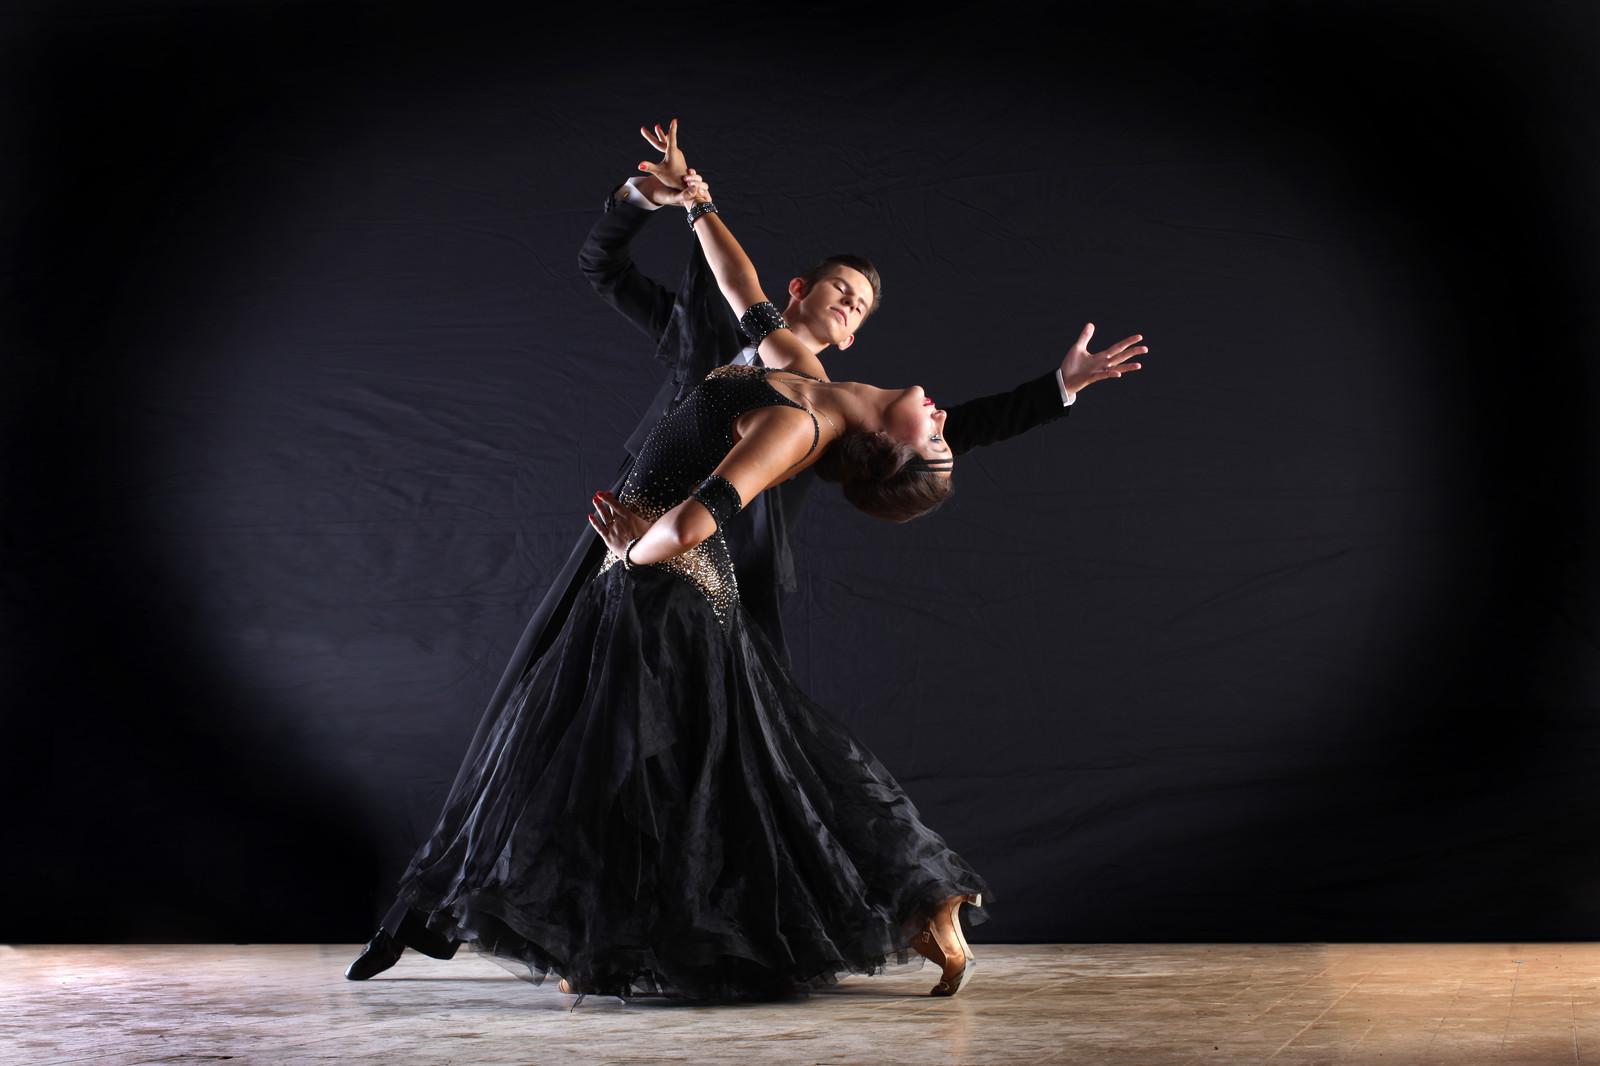 Ballroom Dancing Wallpapers Sports Hq Ballroom Dancing Pictures 4k Wallpapers 2019